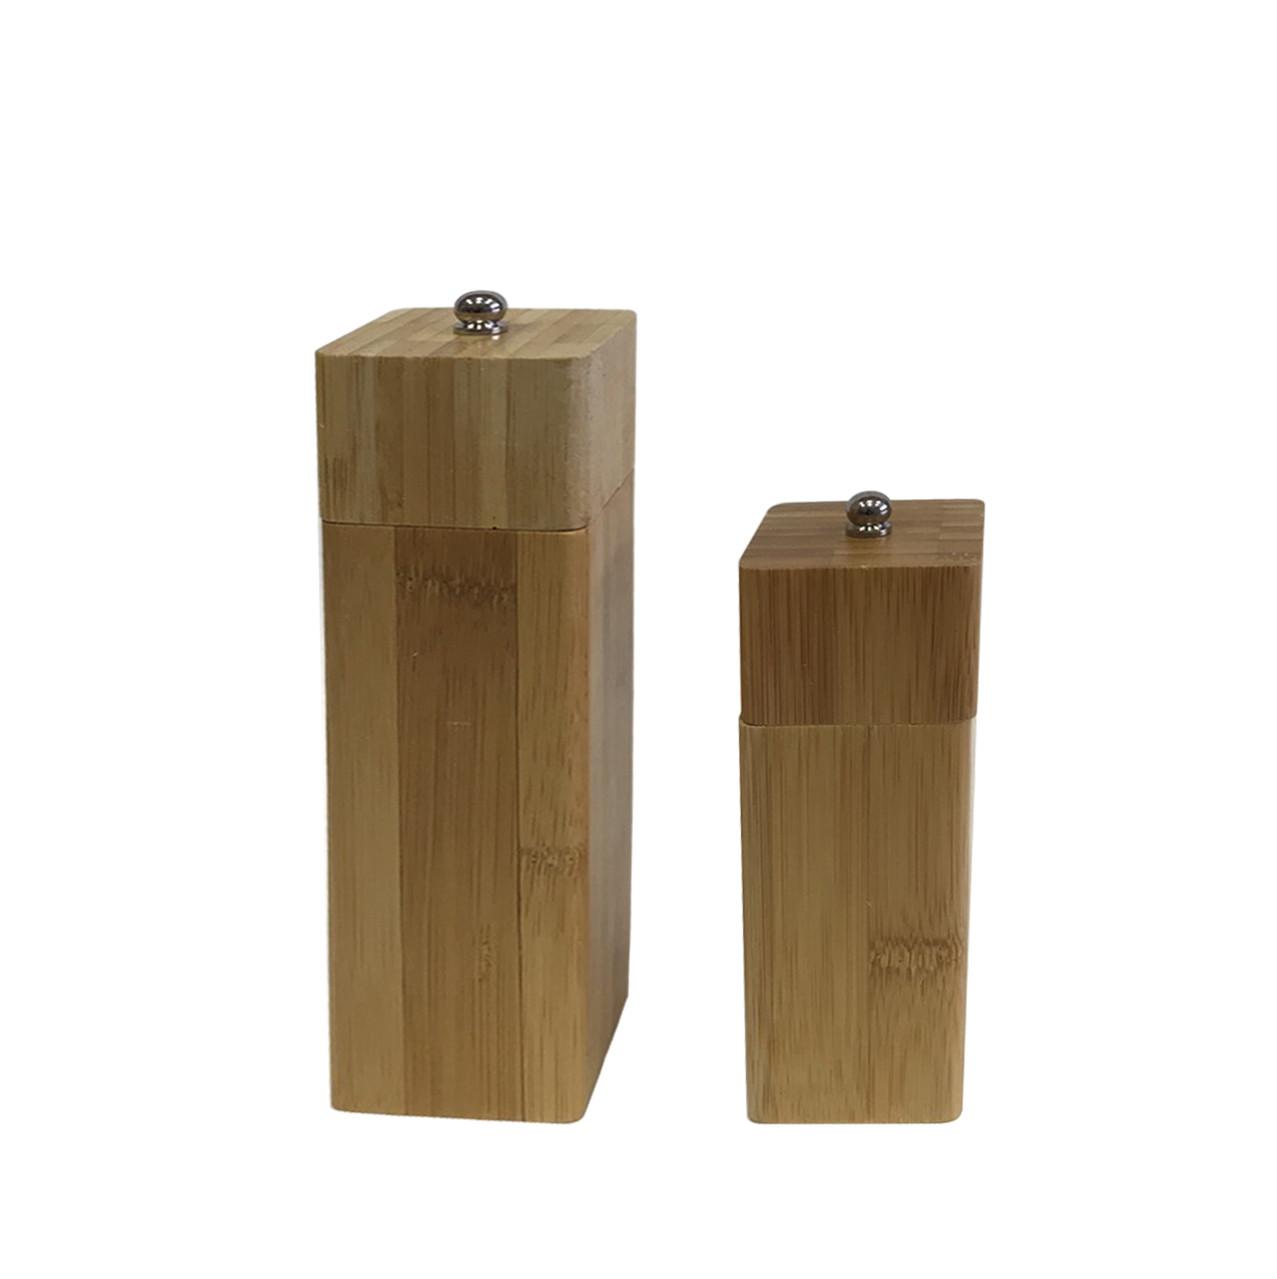 Перцемолка бамбуковая 15 см квадрат